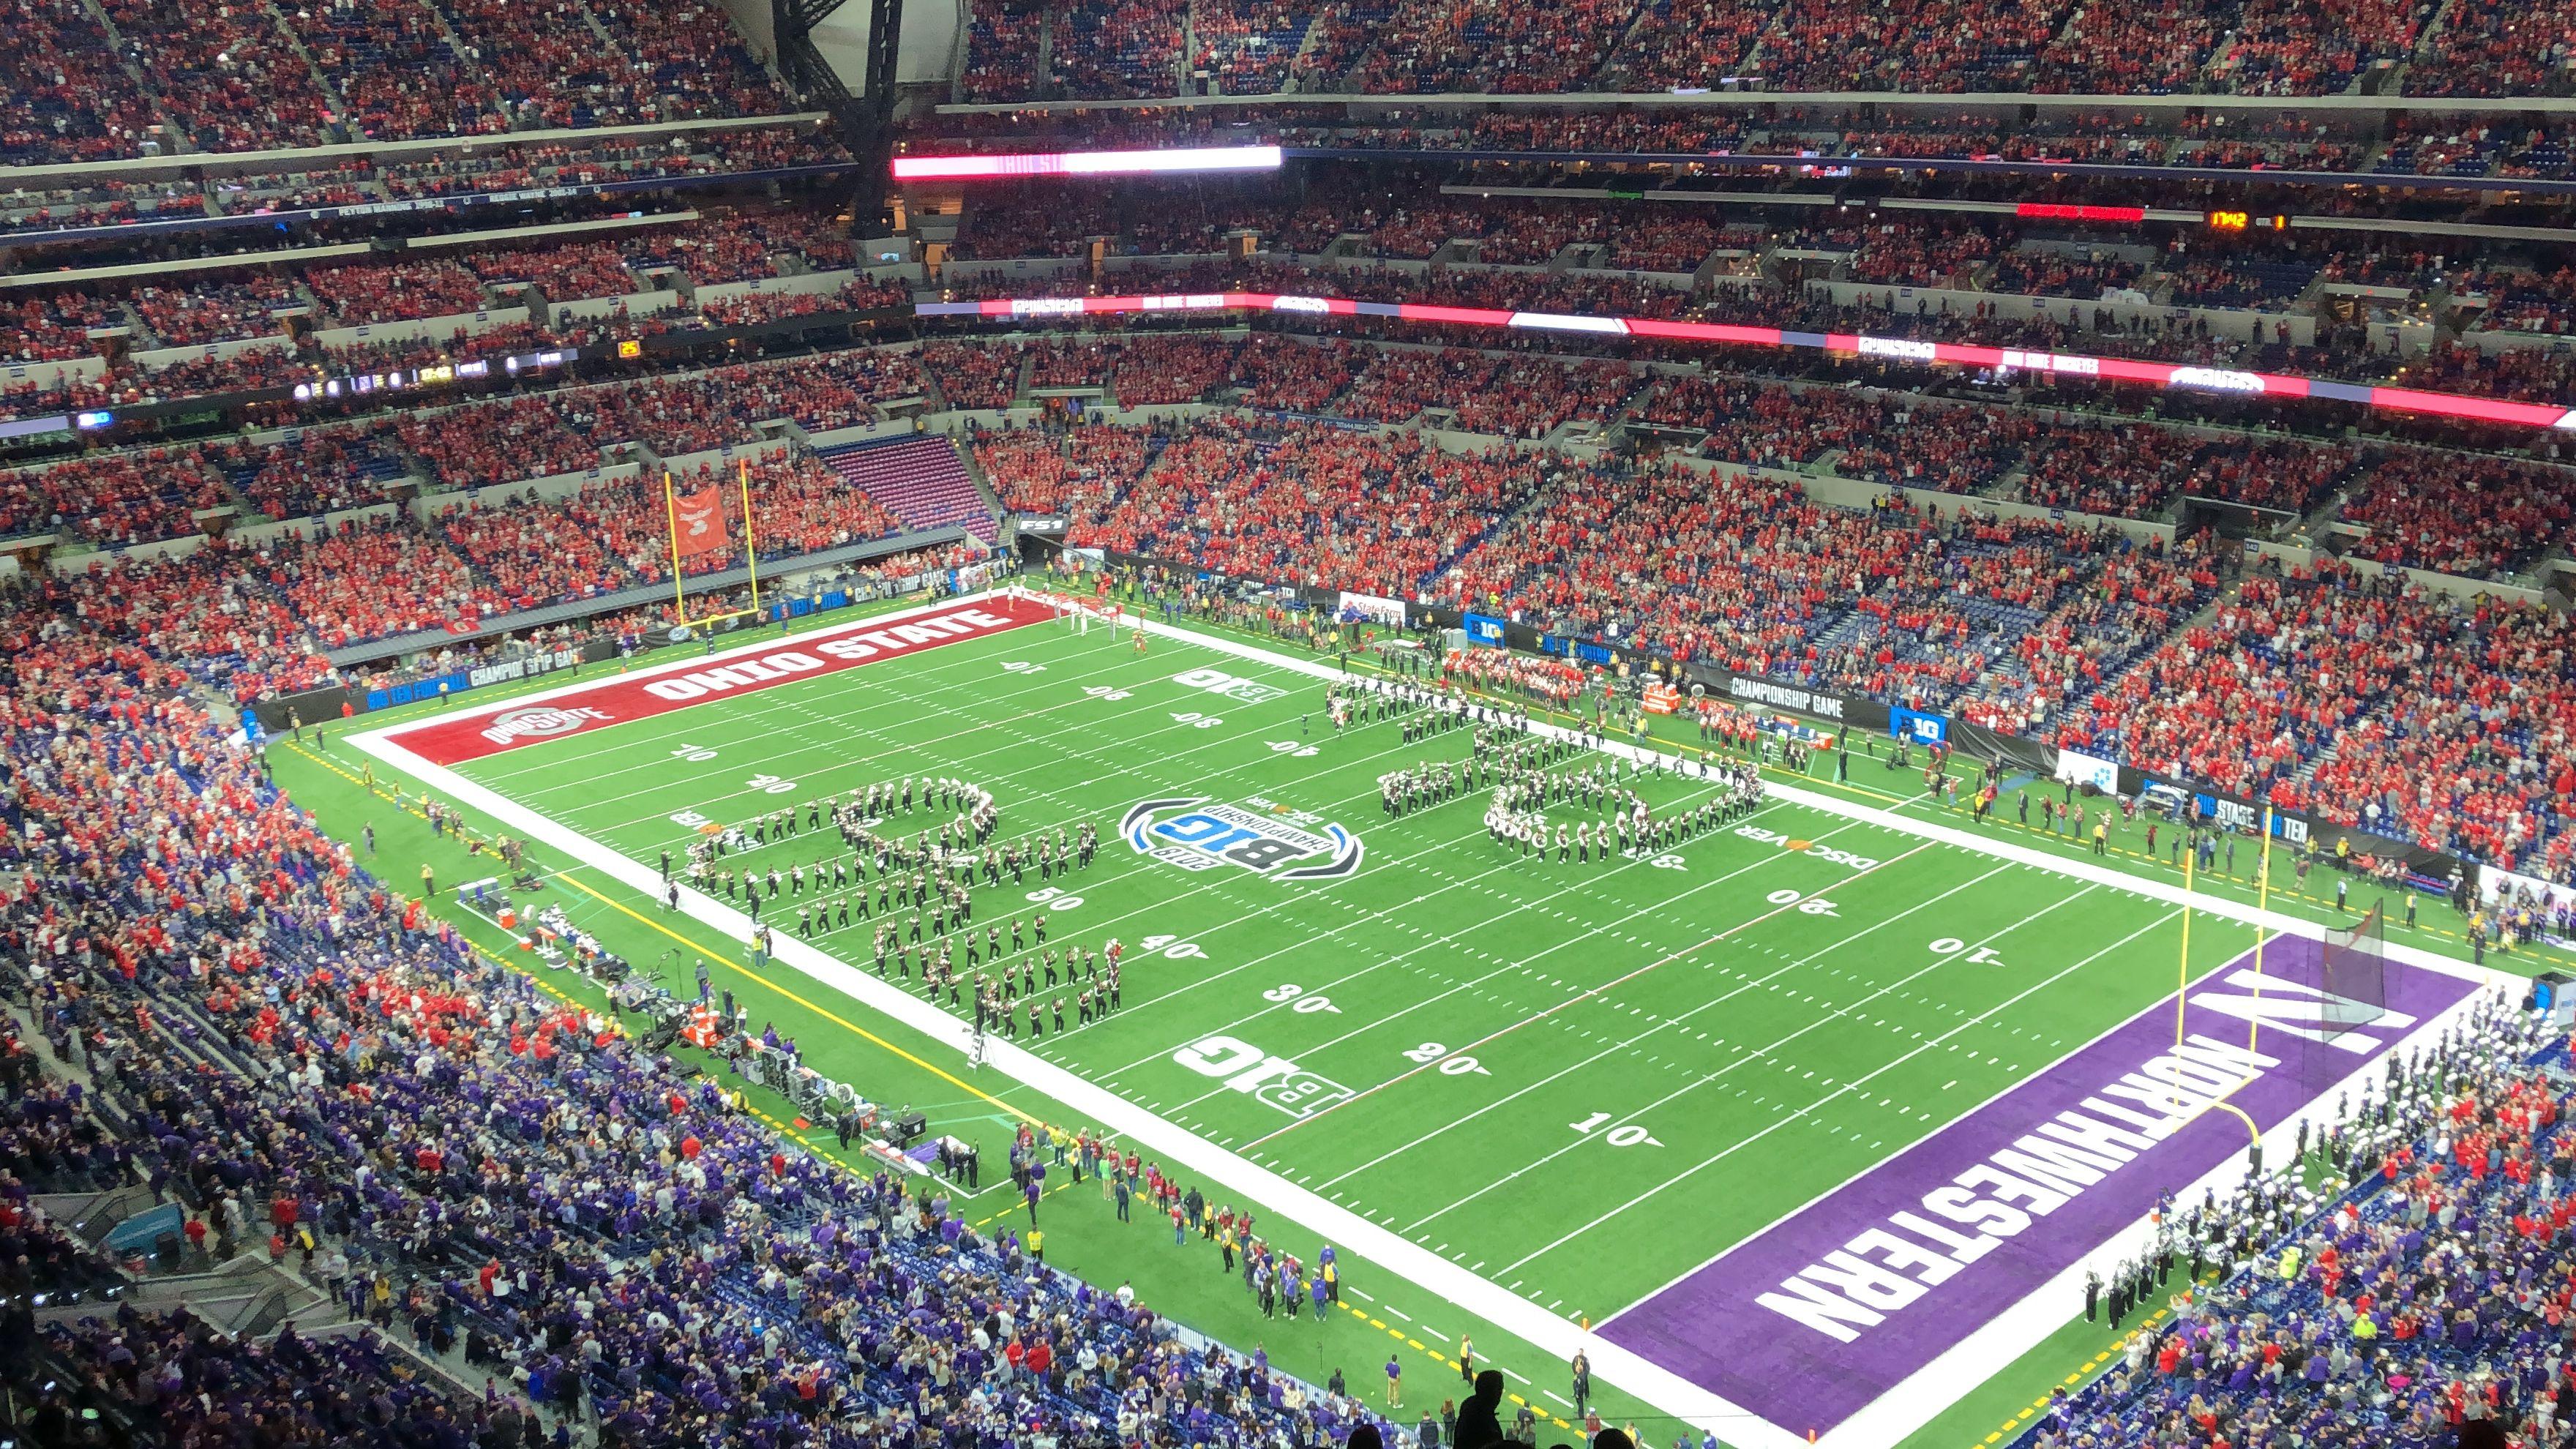 west texas a&m football stadium